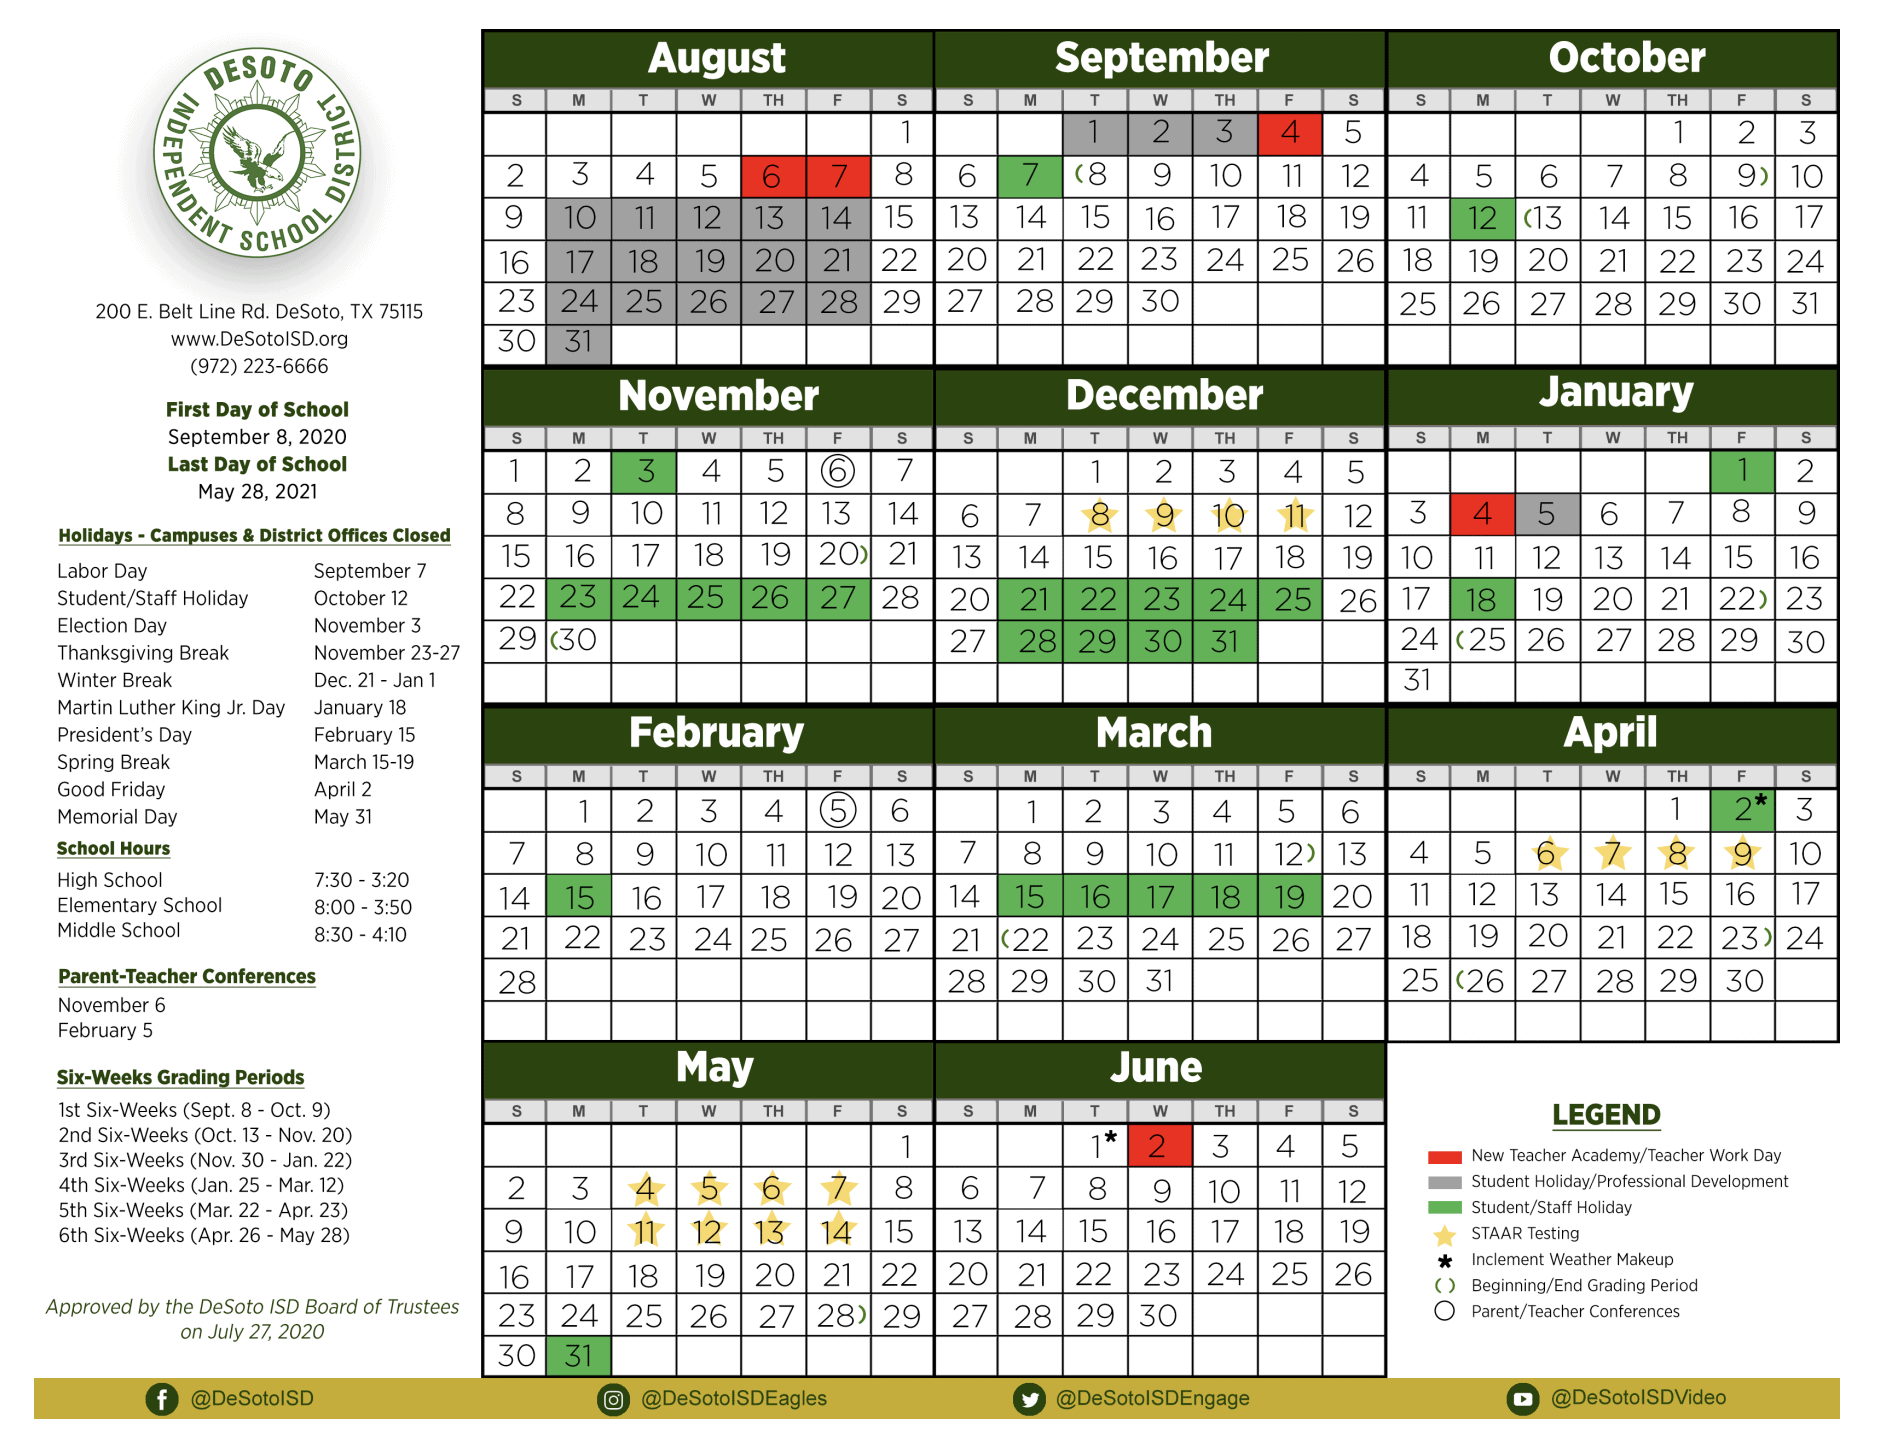 2020-2021 DeSoto ISD Calendar